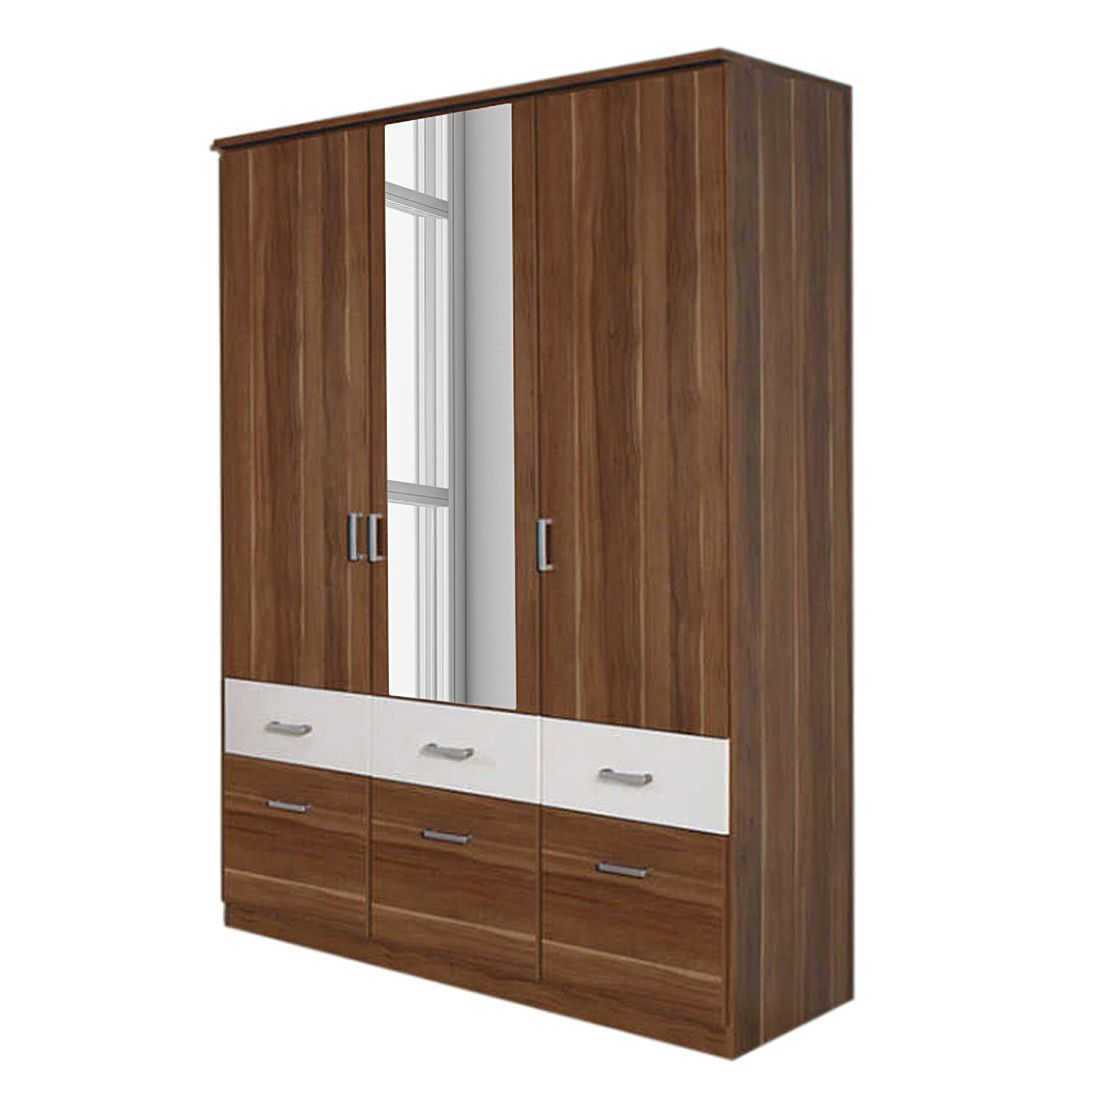 dreht renschrank kombischrank bremen extra kernnuss dekor alpinwei breite 91 cm 2 t rig. Black Bedroom Furniture Sets. Home Design Ideas